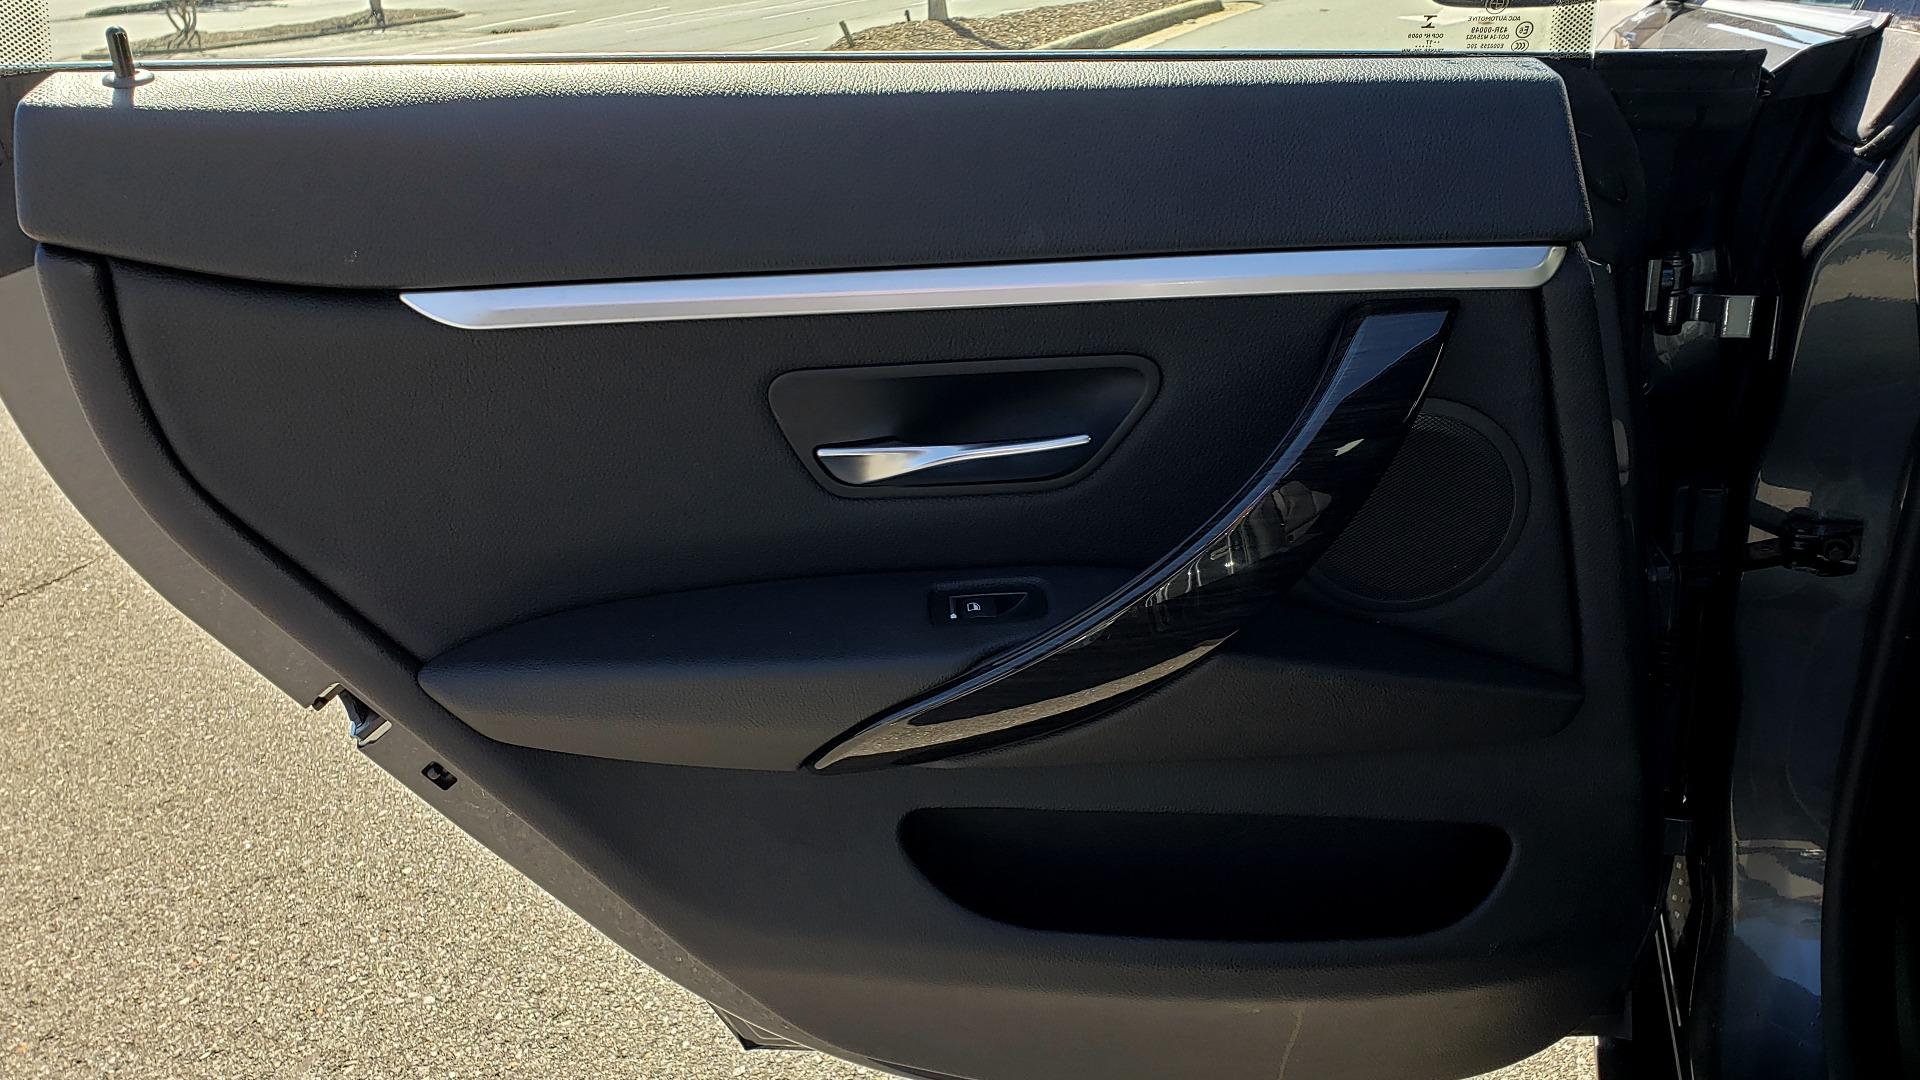 Used 2018 BMW 4 SERIES 430IXDRIVE / PREMIUM / NAV / SUNROOF / ESSENTIALS PKG for sale $29,495 at Formula Imports in Charlotte NC 28227 56